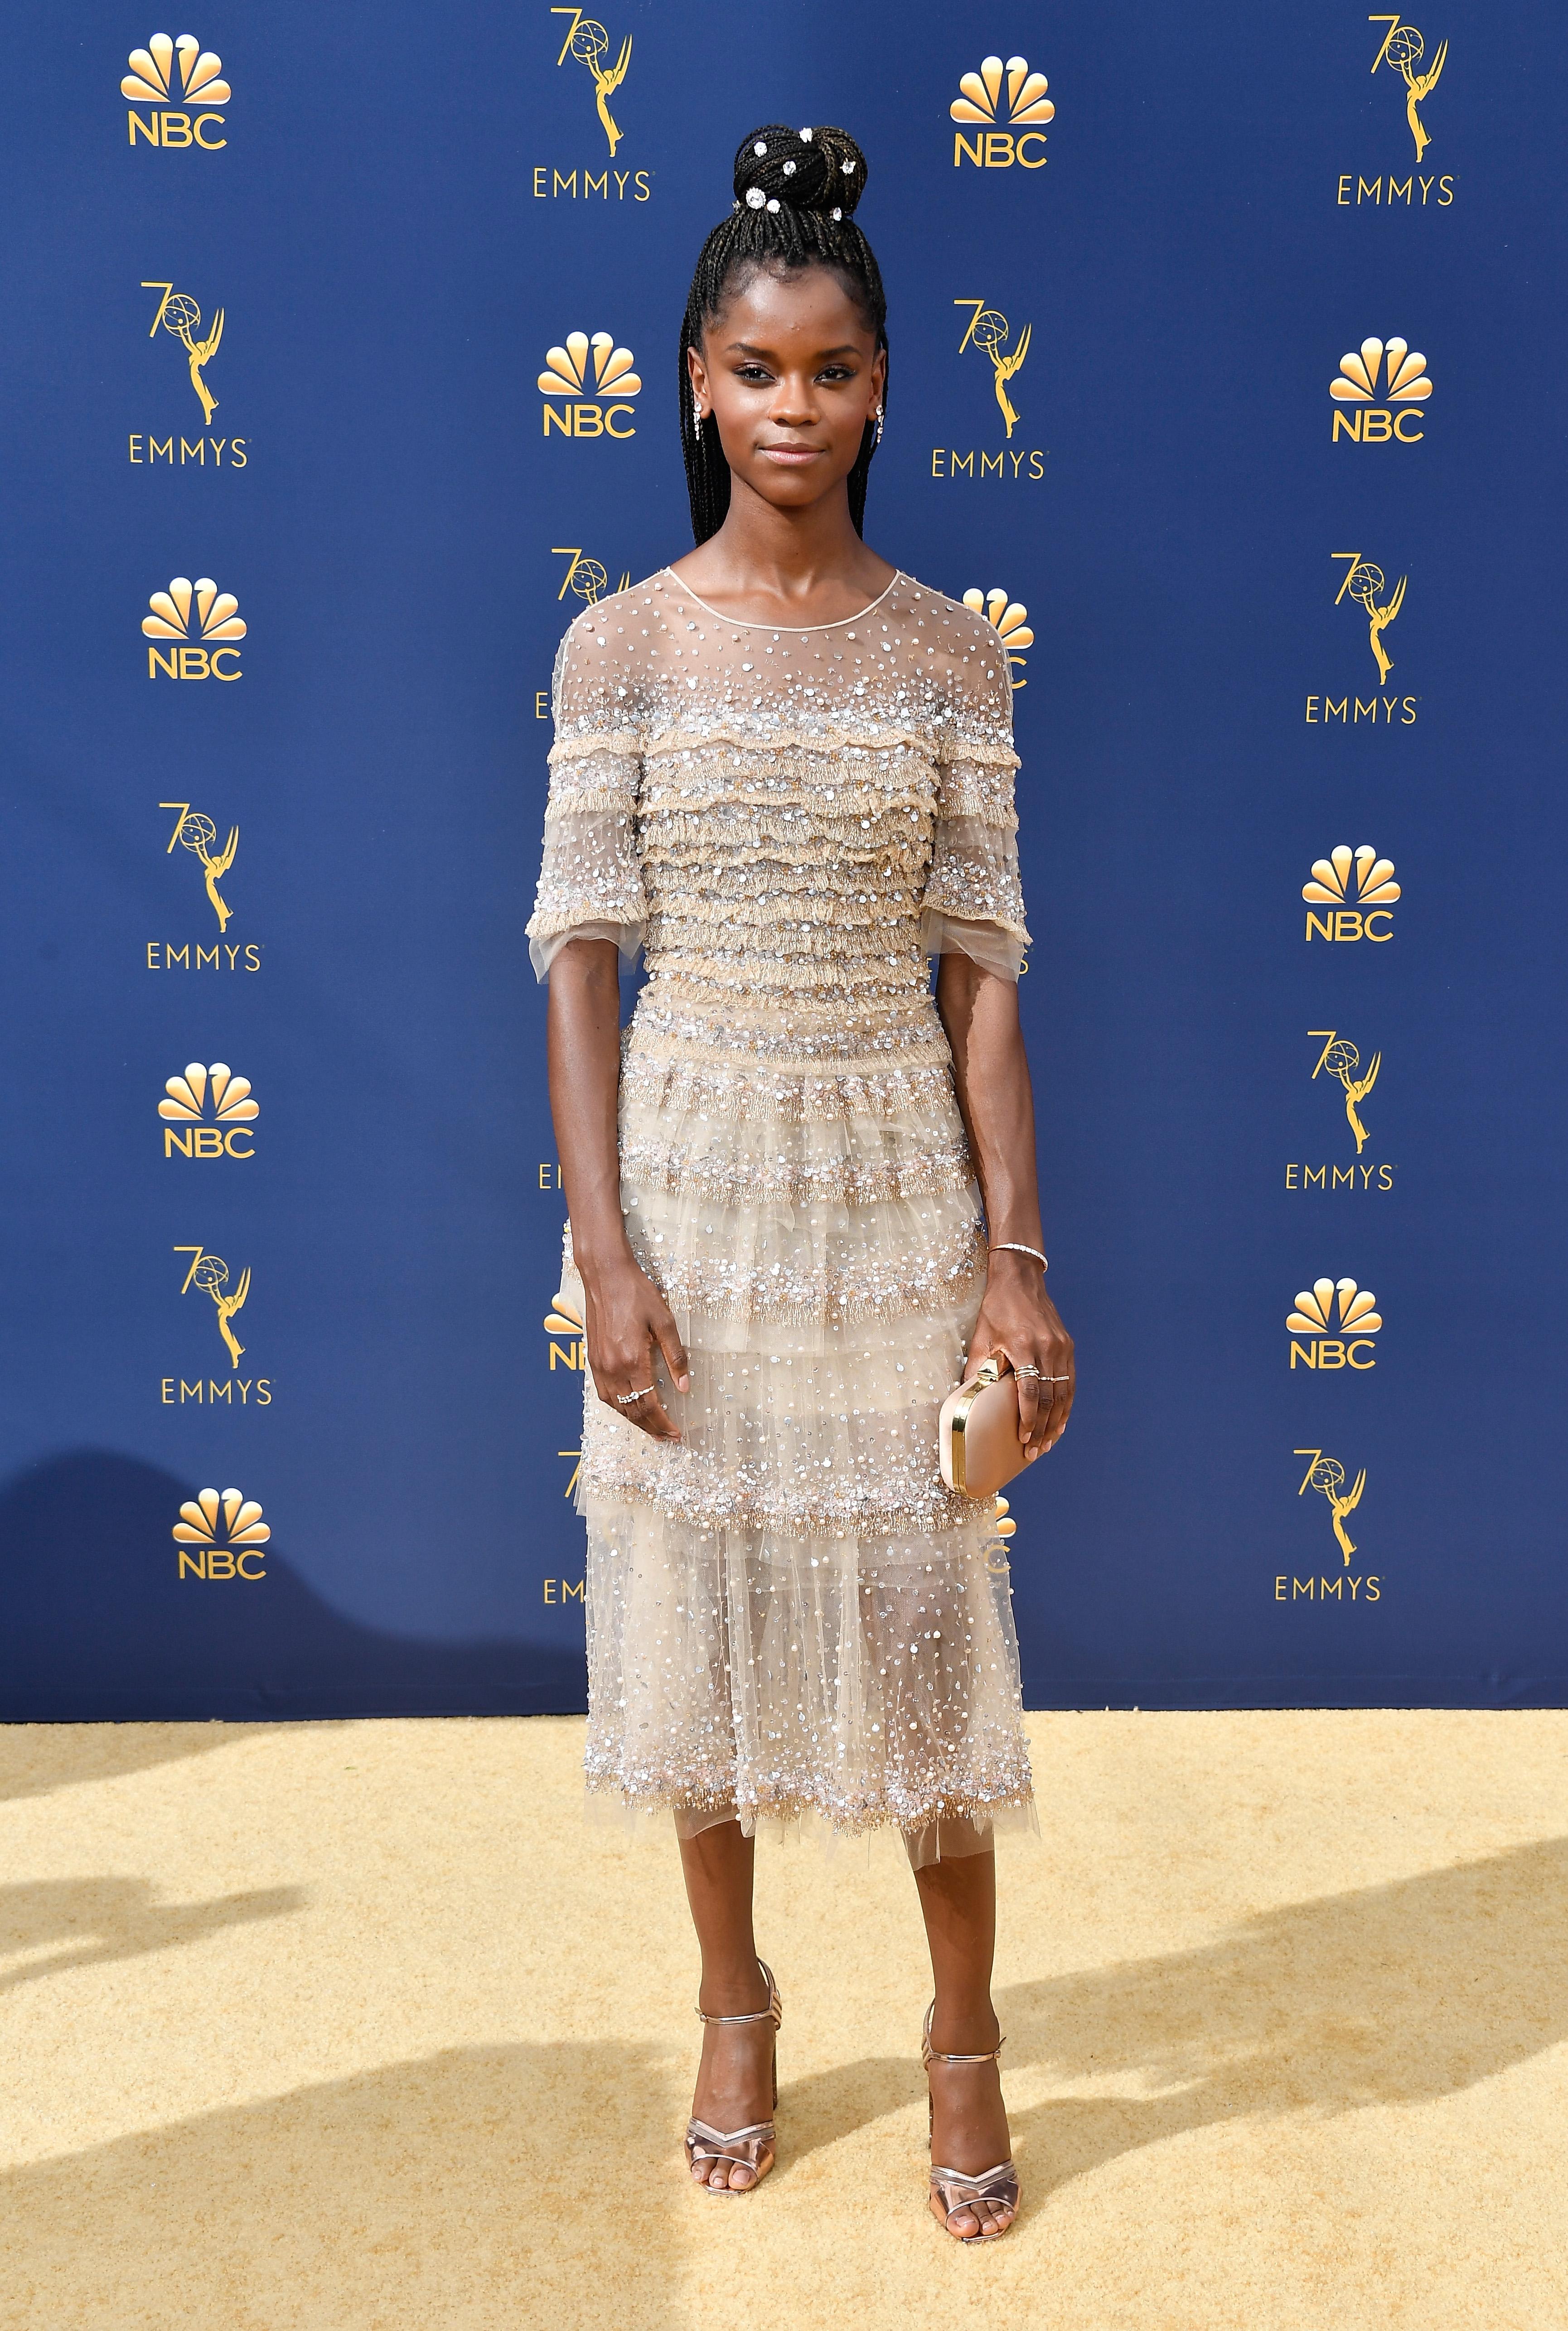 Emmys 2018: Letitia Wright